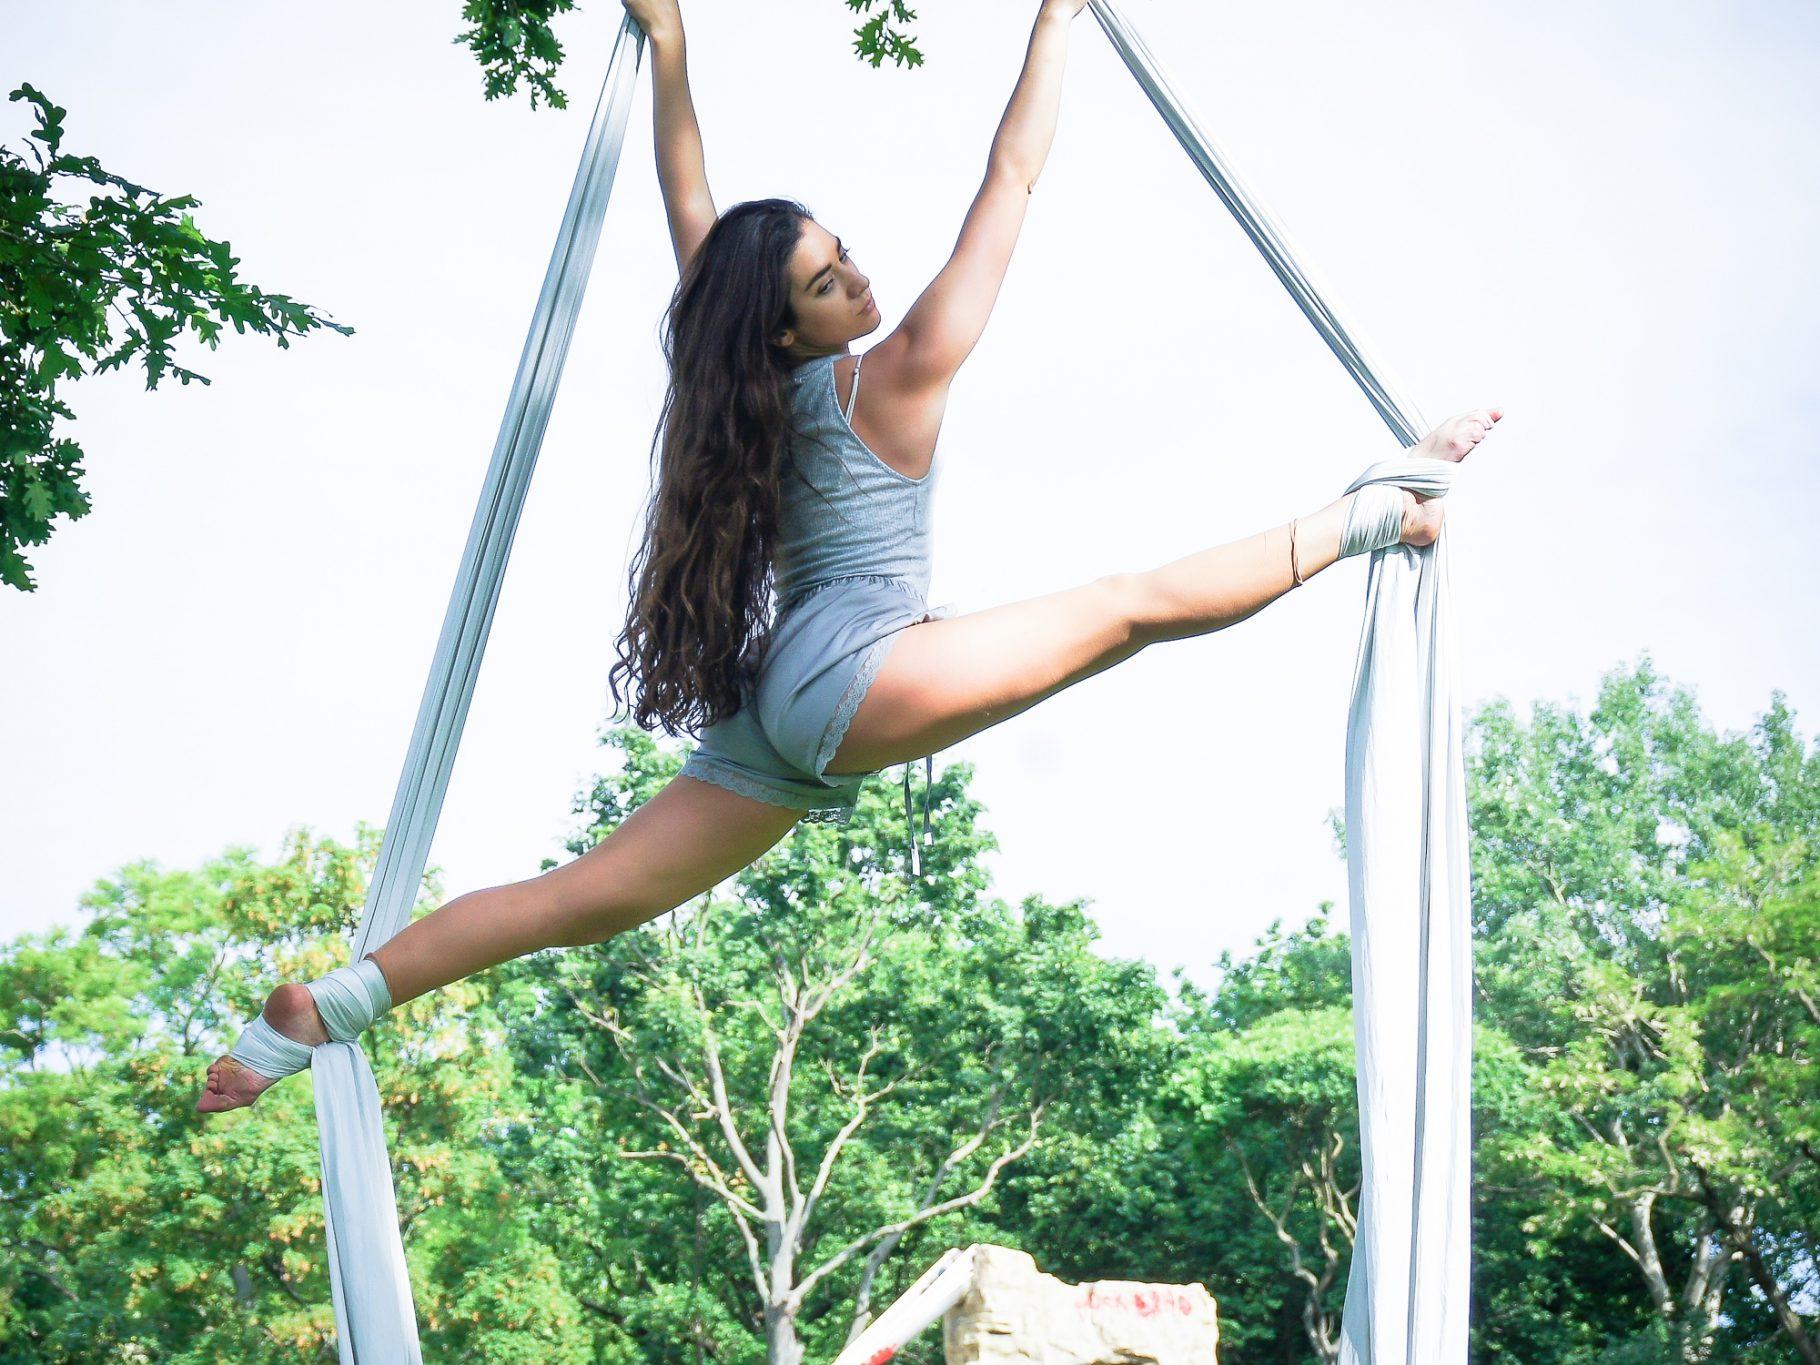 Sport Update: Aerial Silk Dance